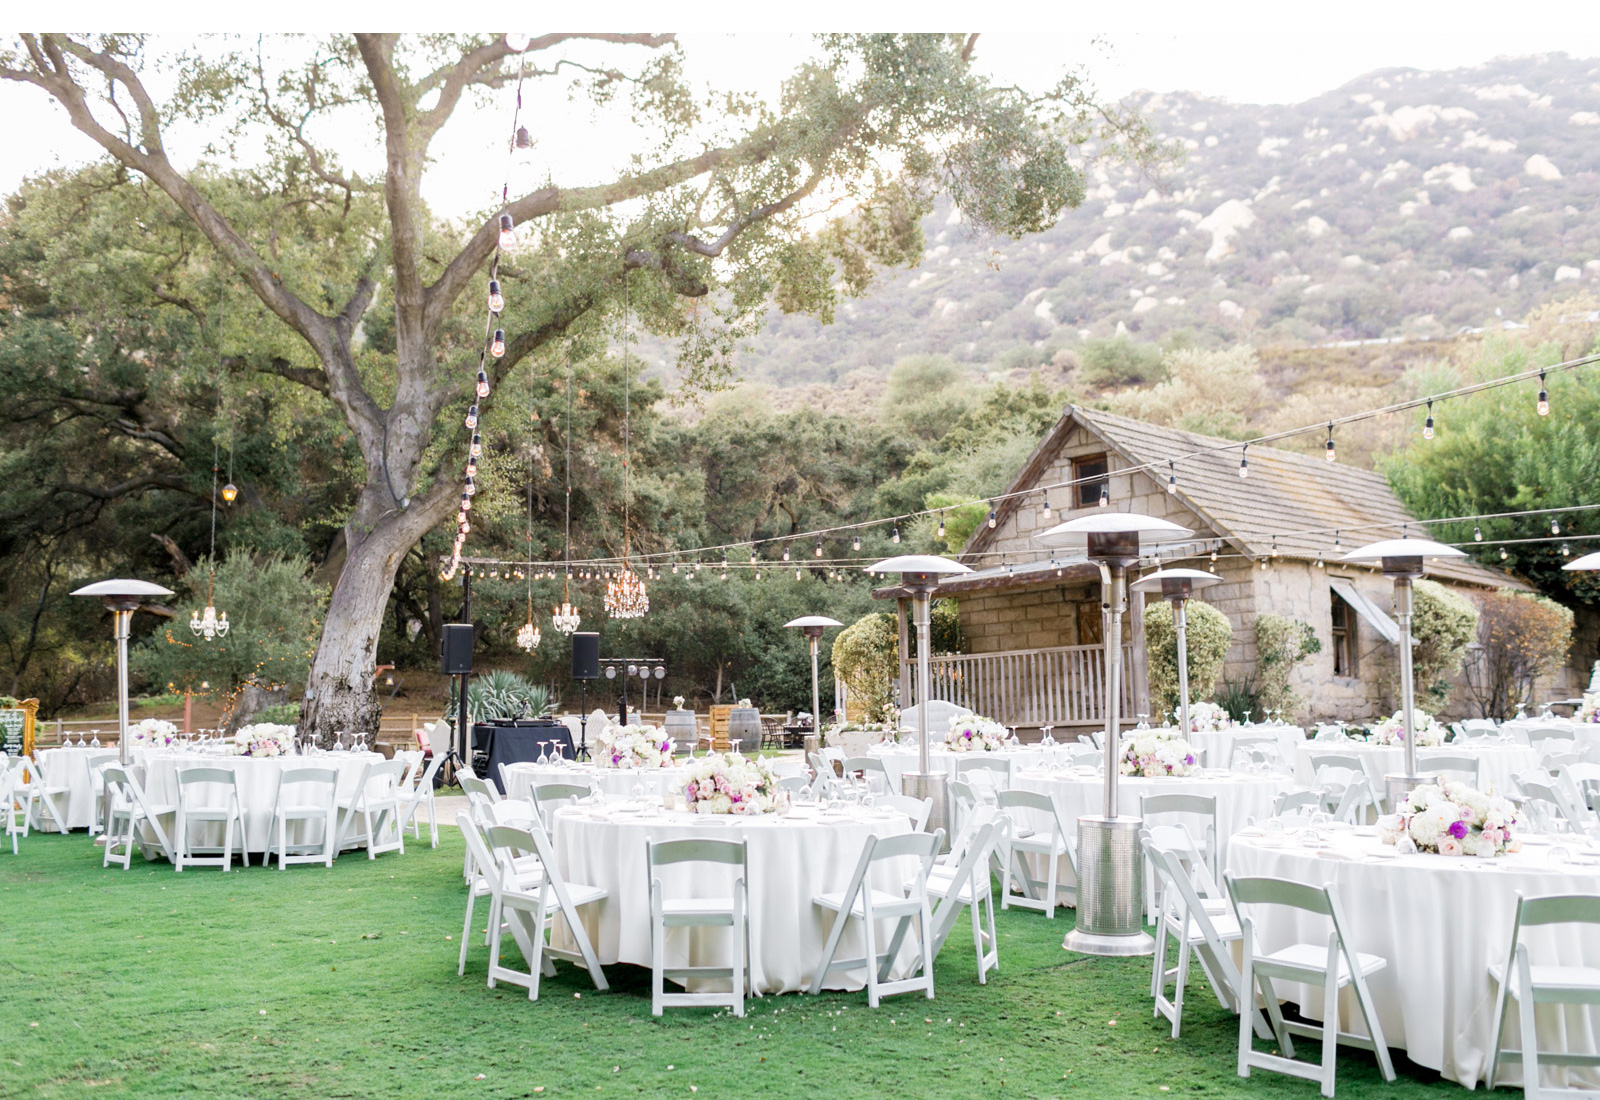 Temecula-Winery-Wedding-Natalie-Schutt-Photography_02.jpg